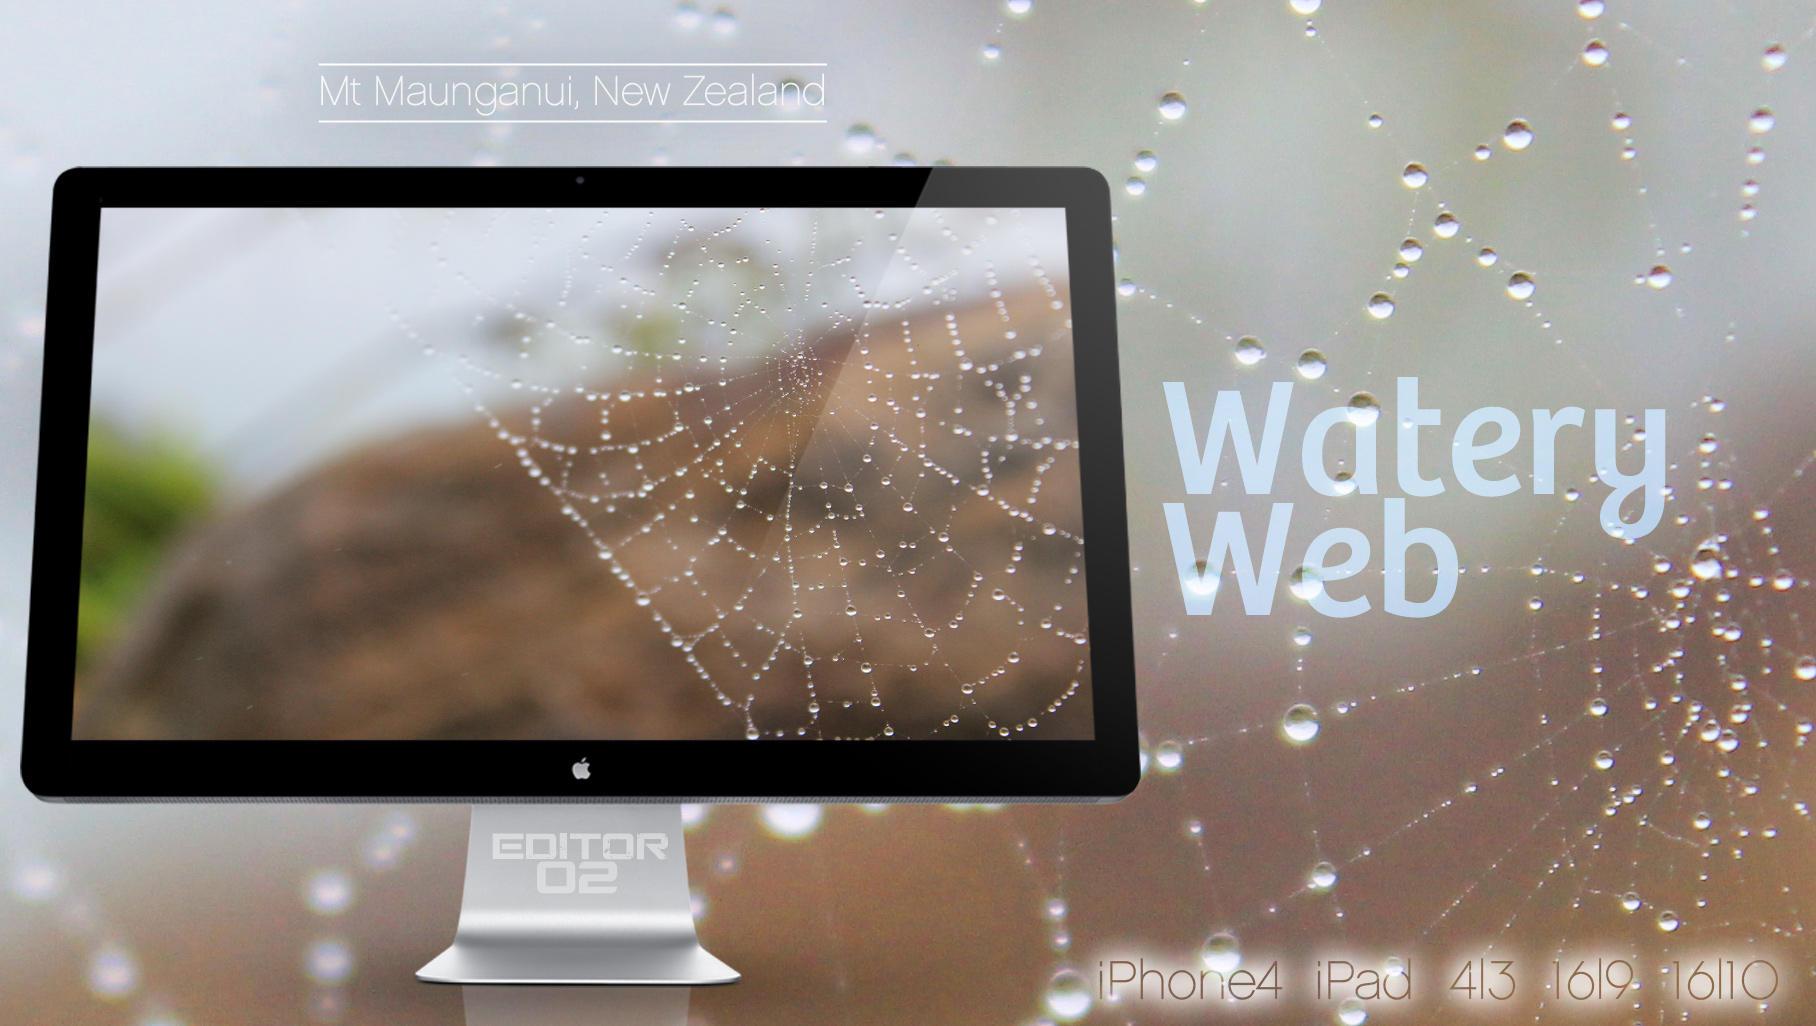 Watery Web - Wallpaper by GavinAsh